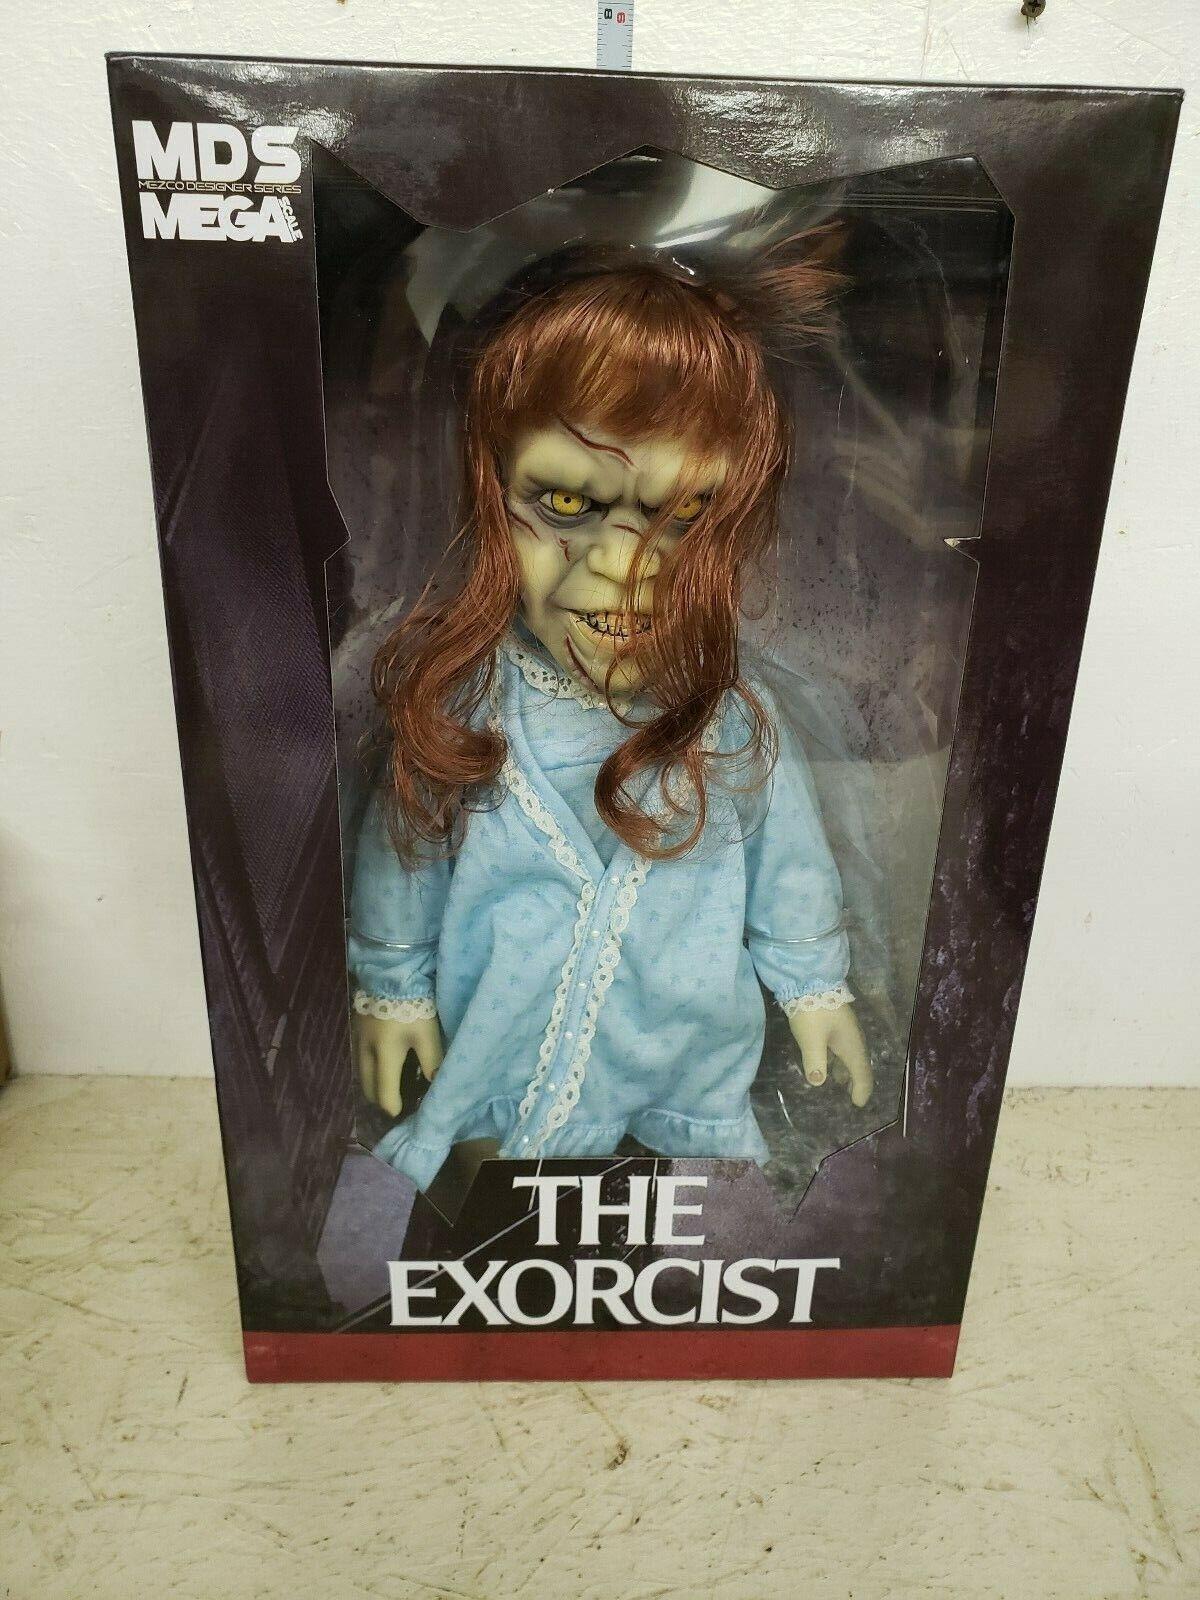 Mezco Mega The Exorcist Regan 15in Figure in package